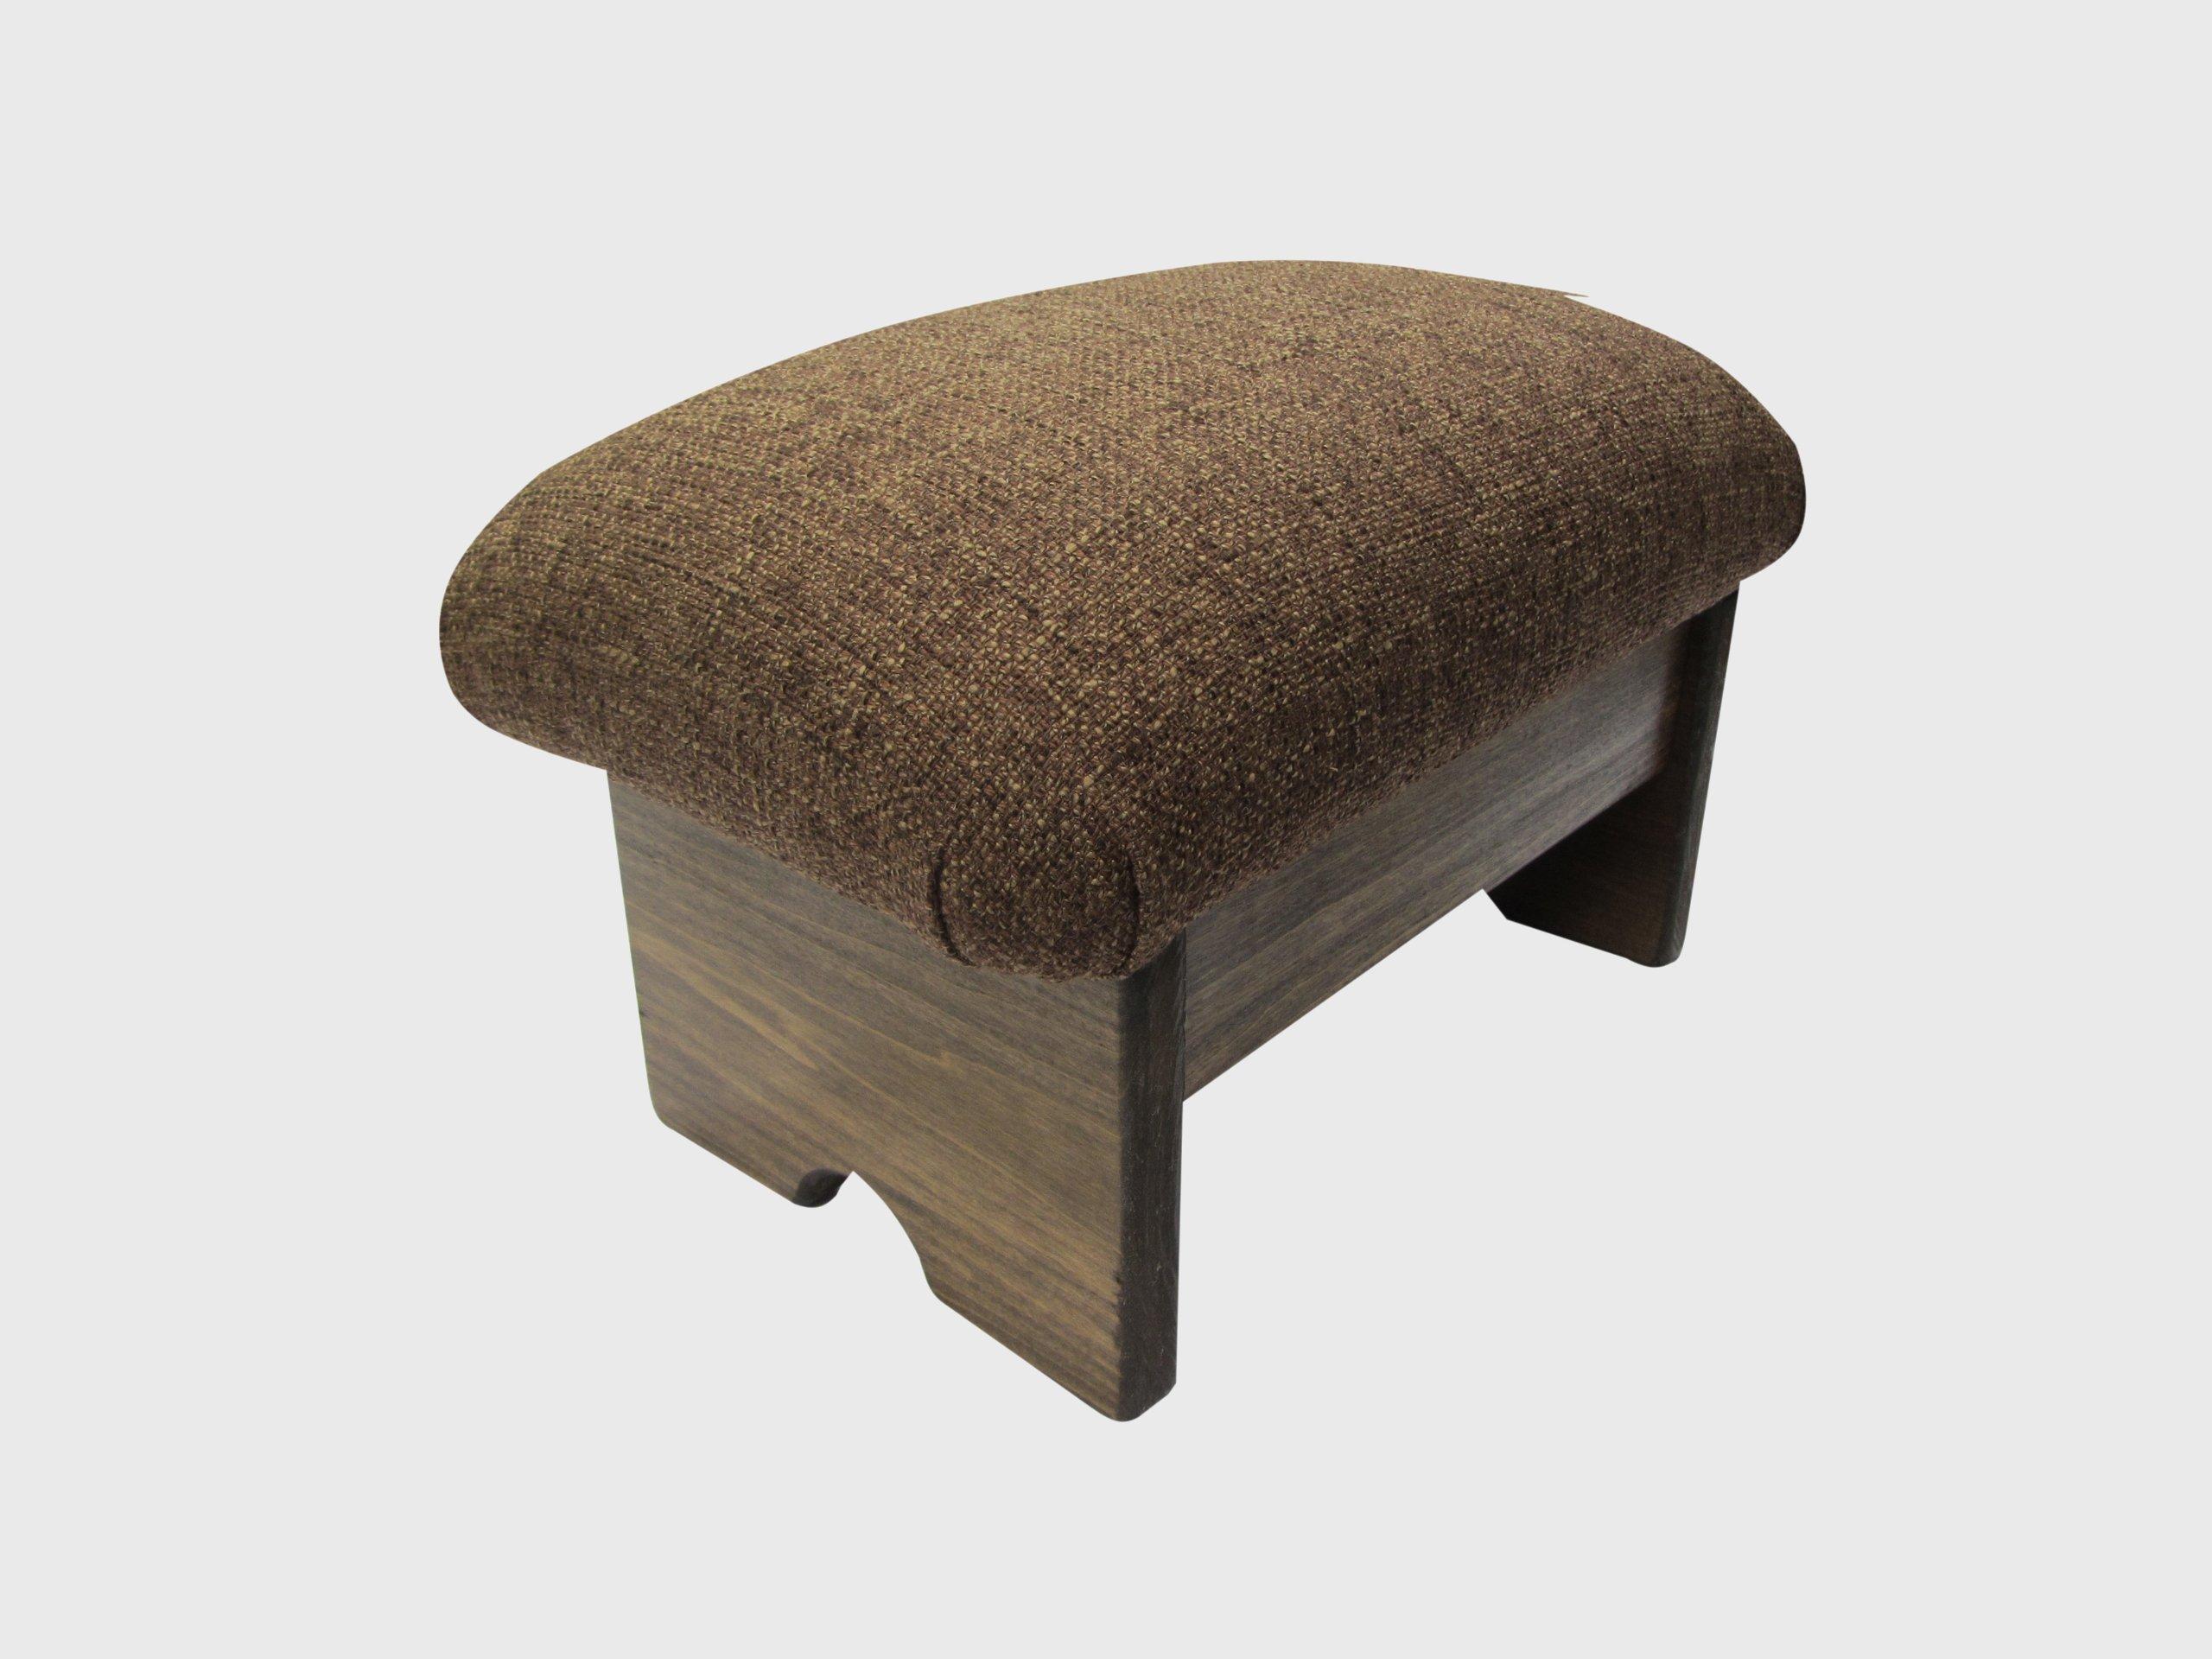 KR Ideas Padded Foot Stool Solid Fabrics 9'' Tall, Walnut Stain (Made in The USA) (Desert Sand - Walnut)